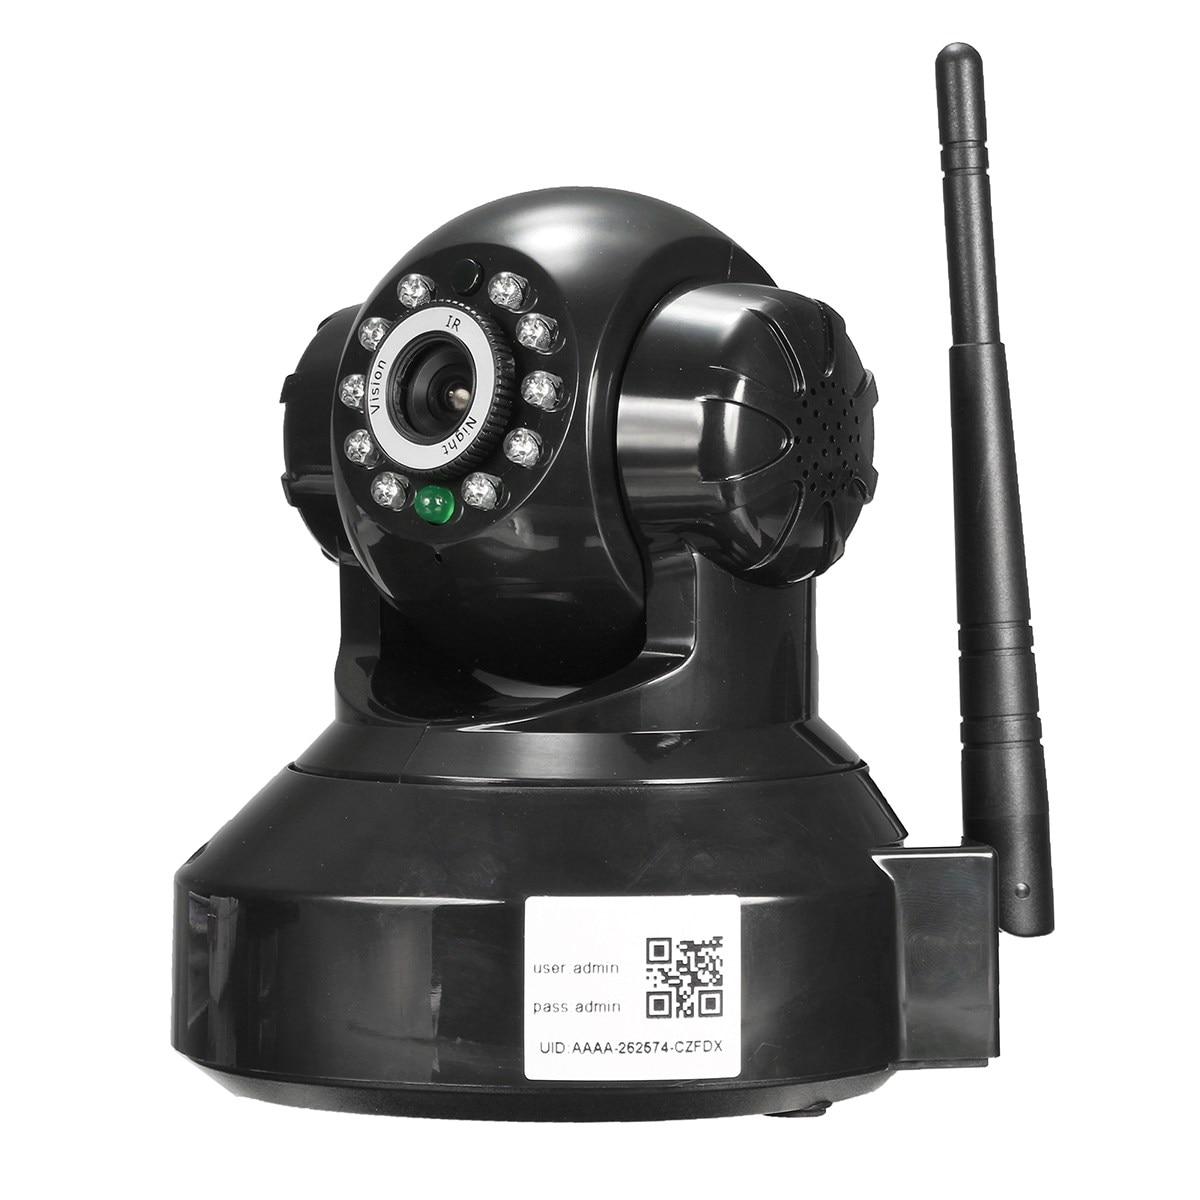 Safurance Wireless HD 720P P2P WiFi Network Home Security Surveillance Pan Tilt IP Camera Safety